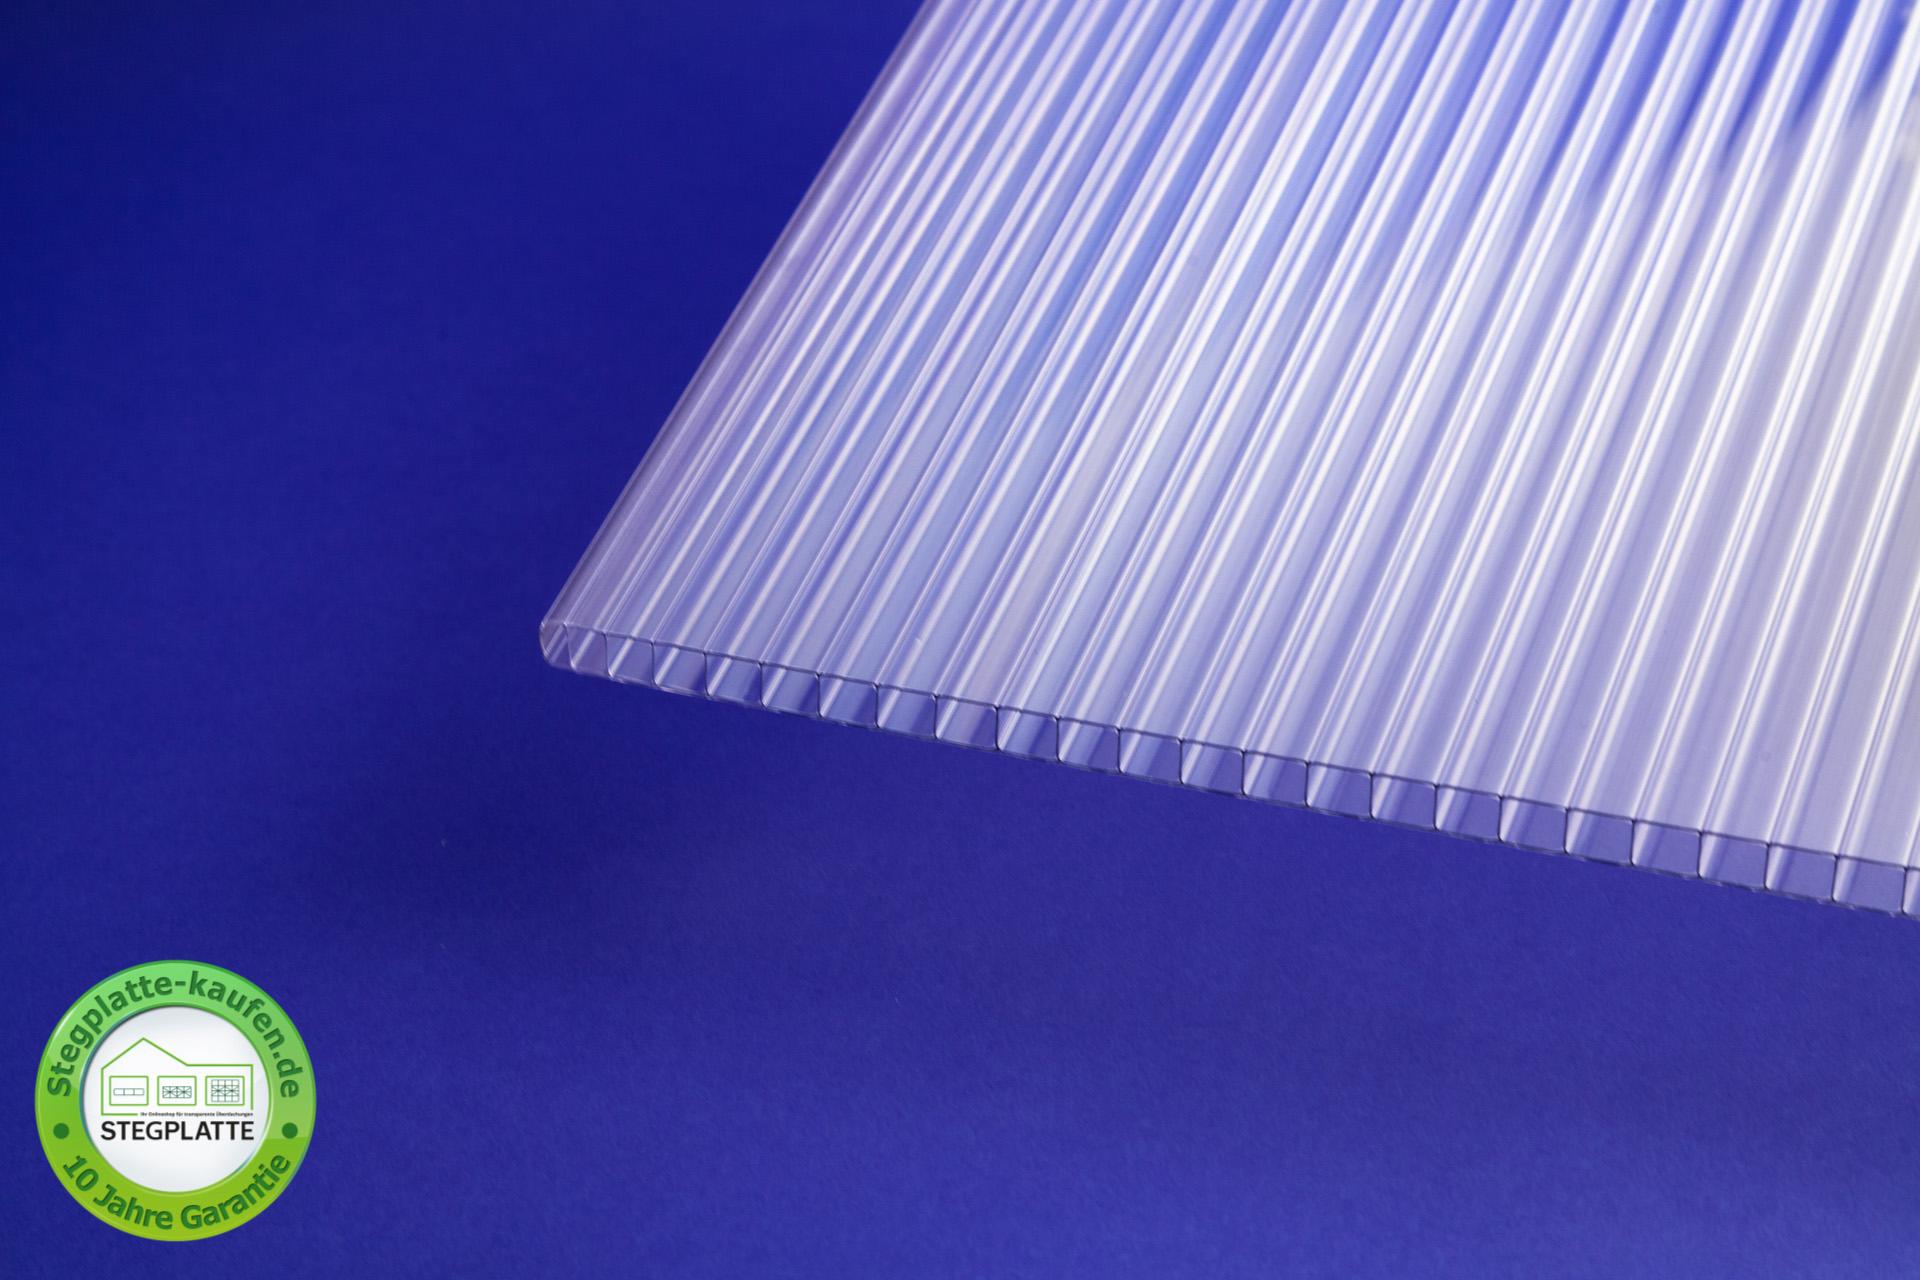 Stegplatte 6 mm Polycarbonat klar Produktbild